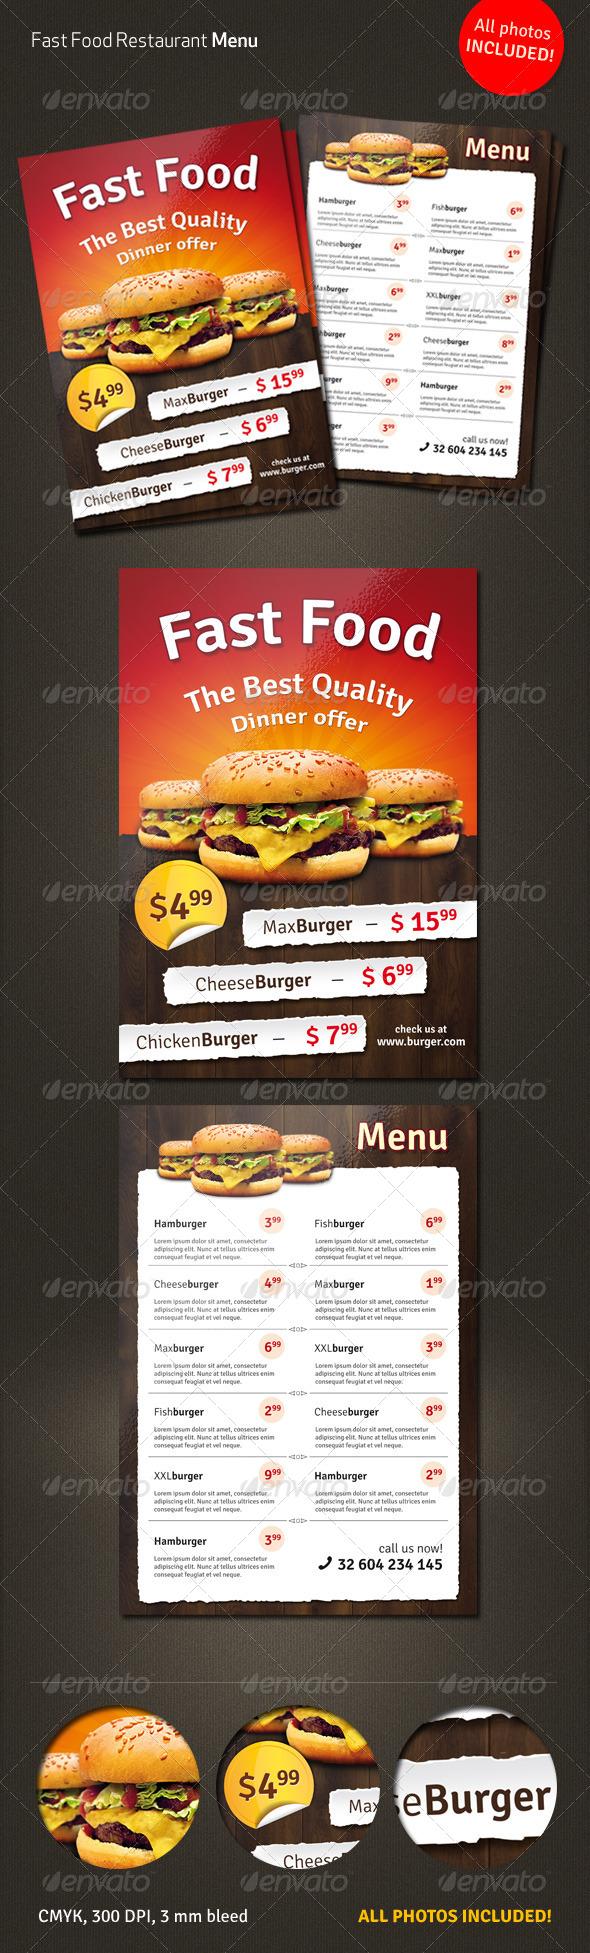 Fast Food Menu Flyer - Restaurant Flyers